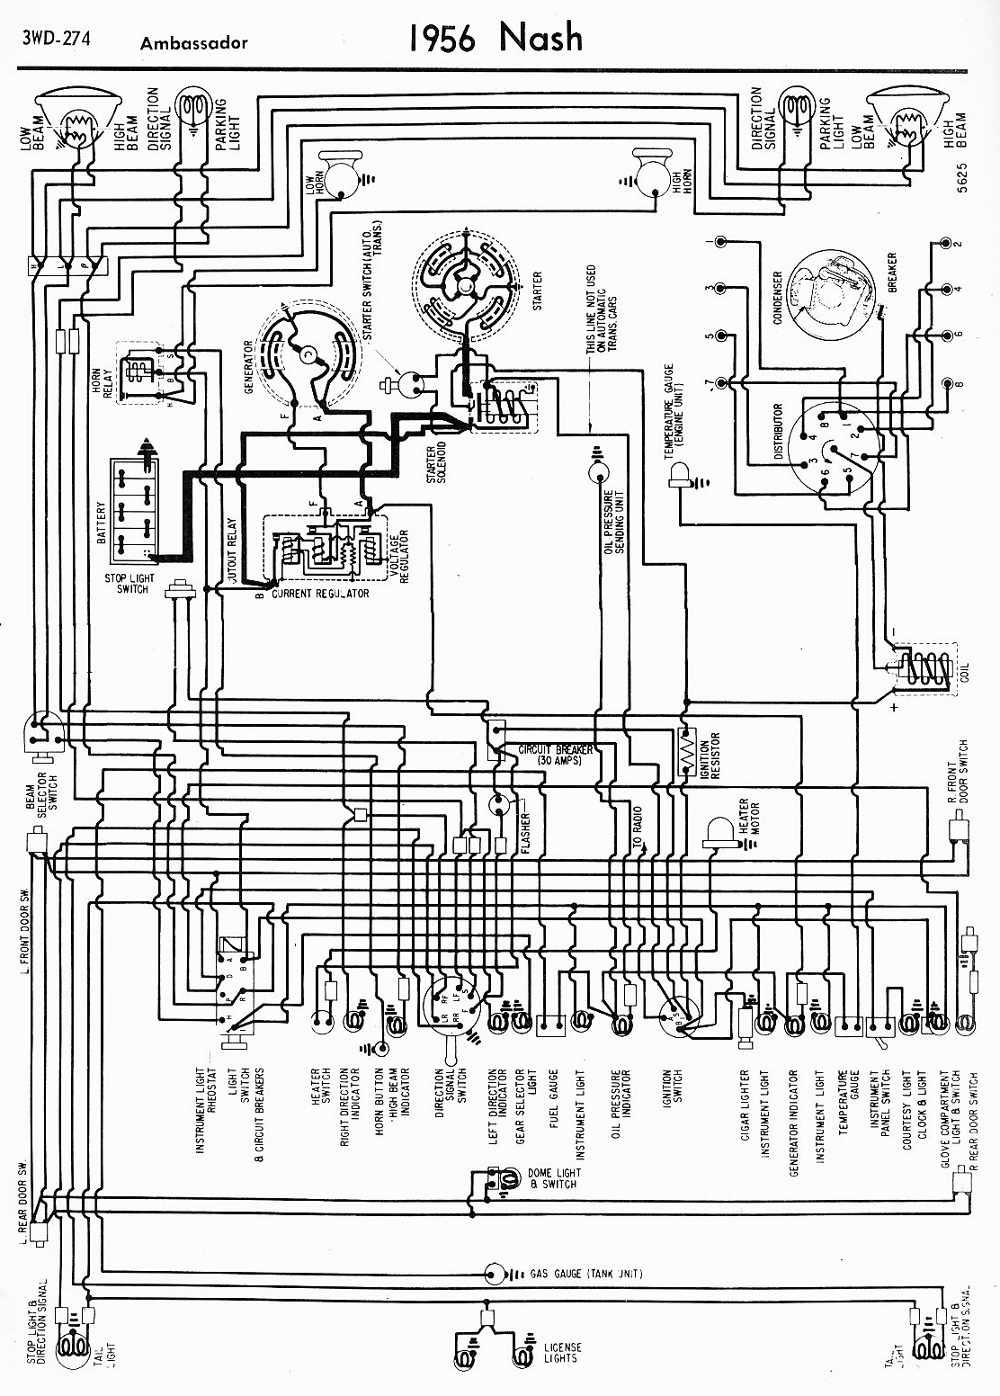 1961 Ford Generator Wiring Diagram - Schematic Diagrams